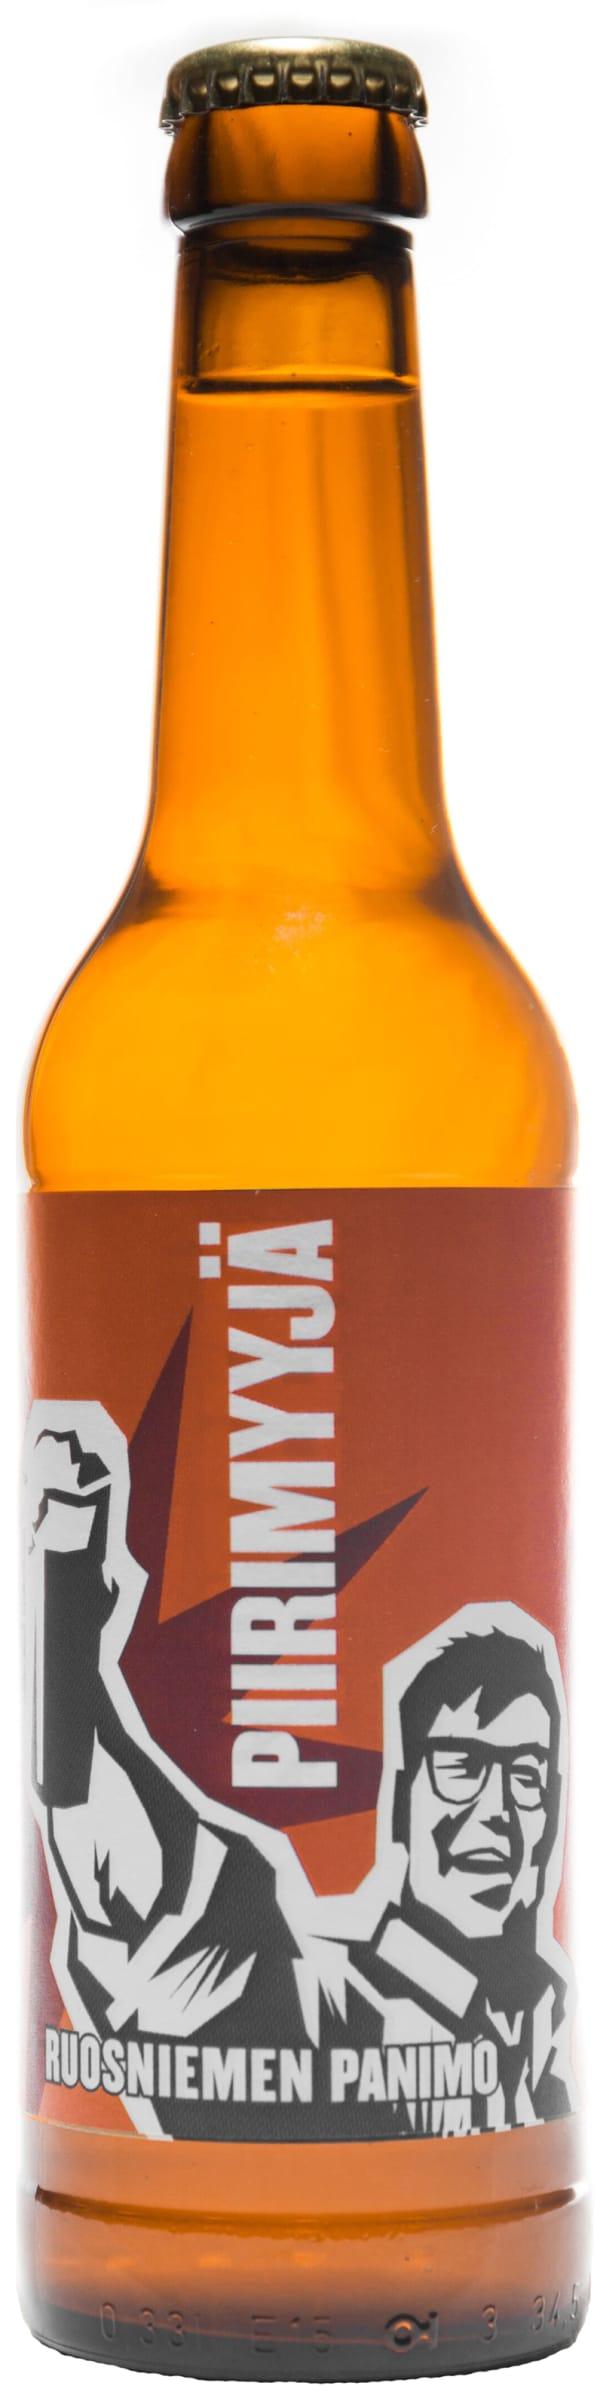 Ruosniemen Piirimyyjä American Pale Ale